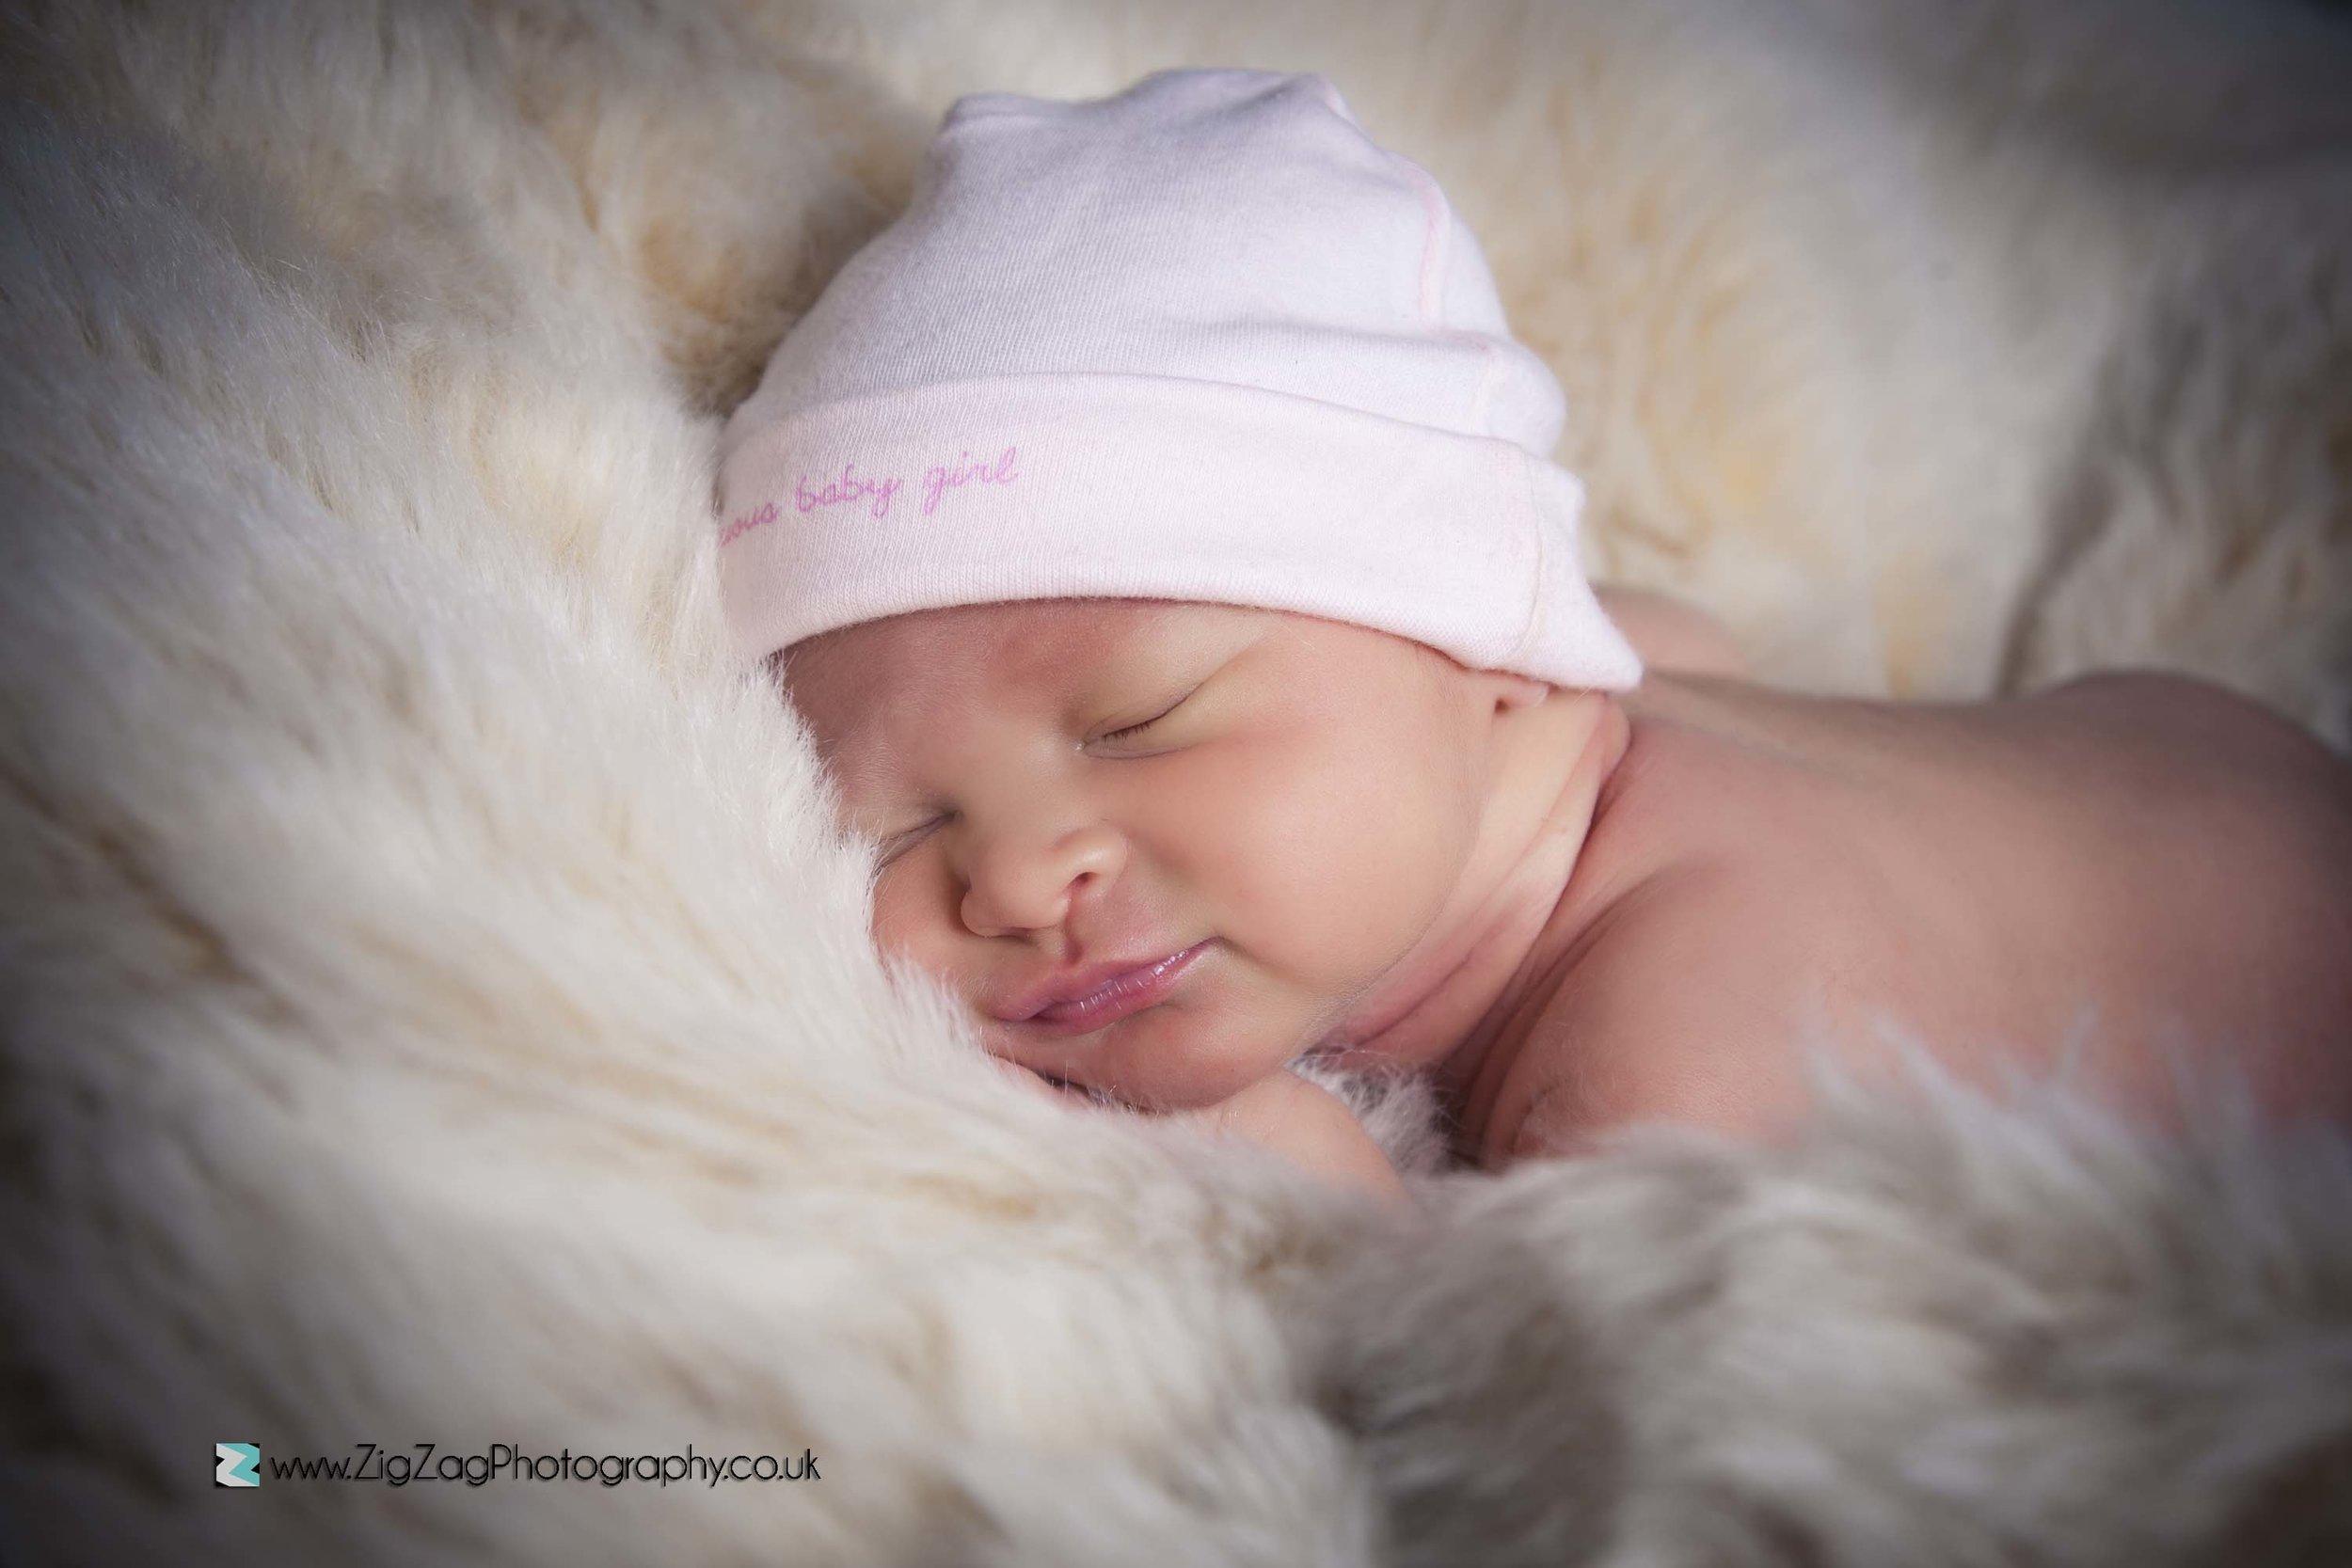 newborn-photography-photoshoot-leicester-studio-baby-fur-sleeping.jpg